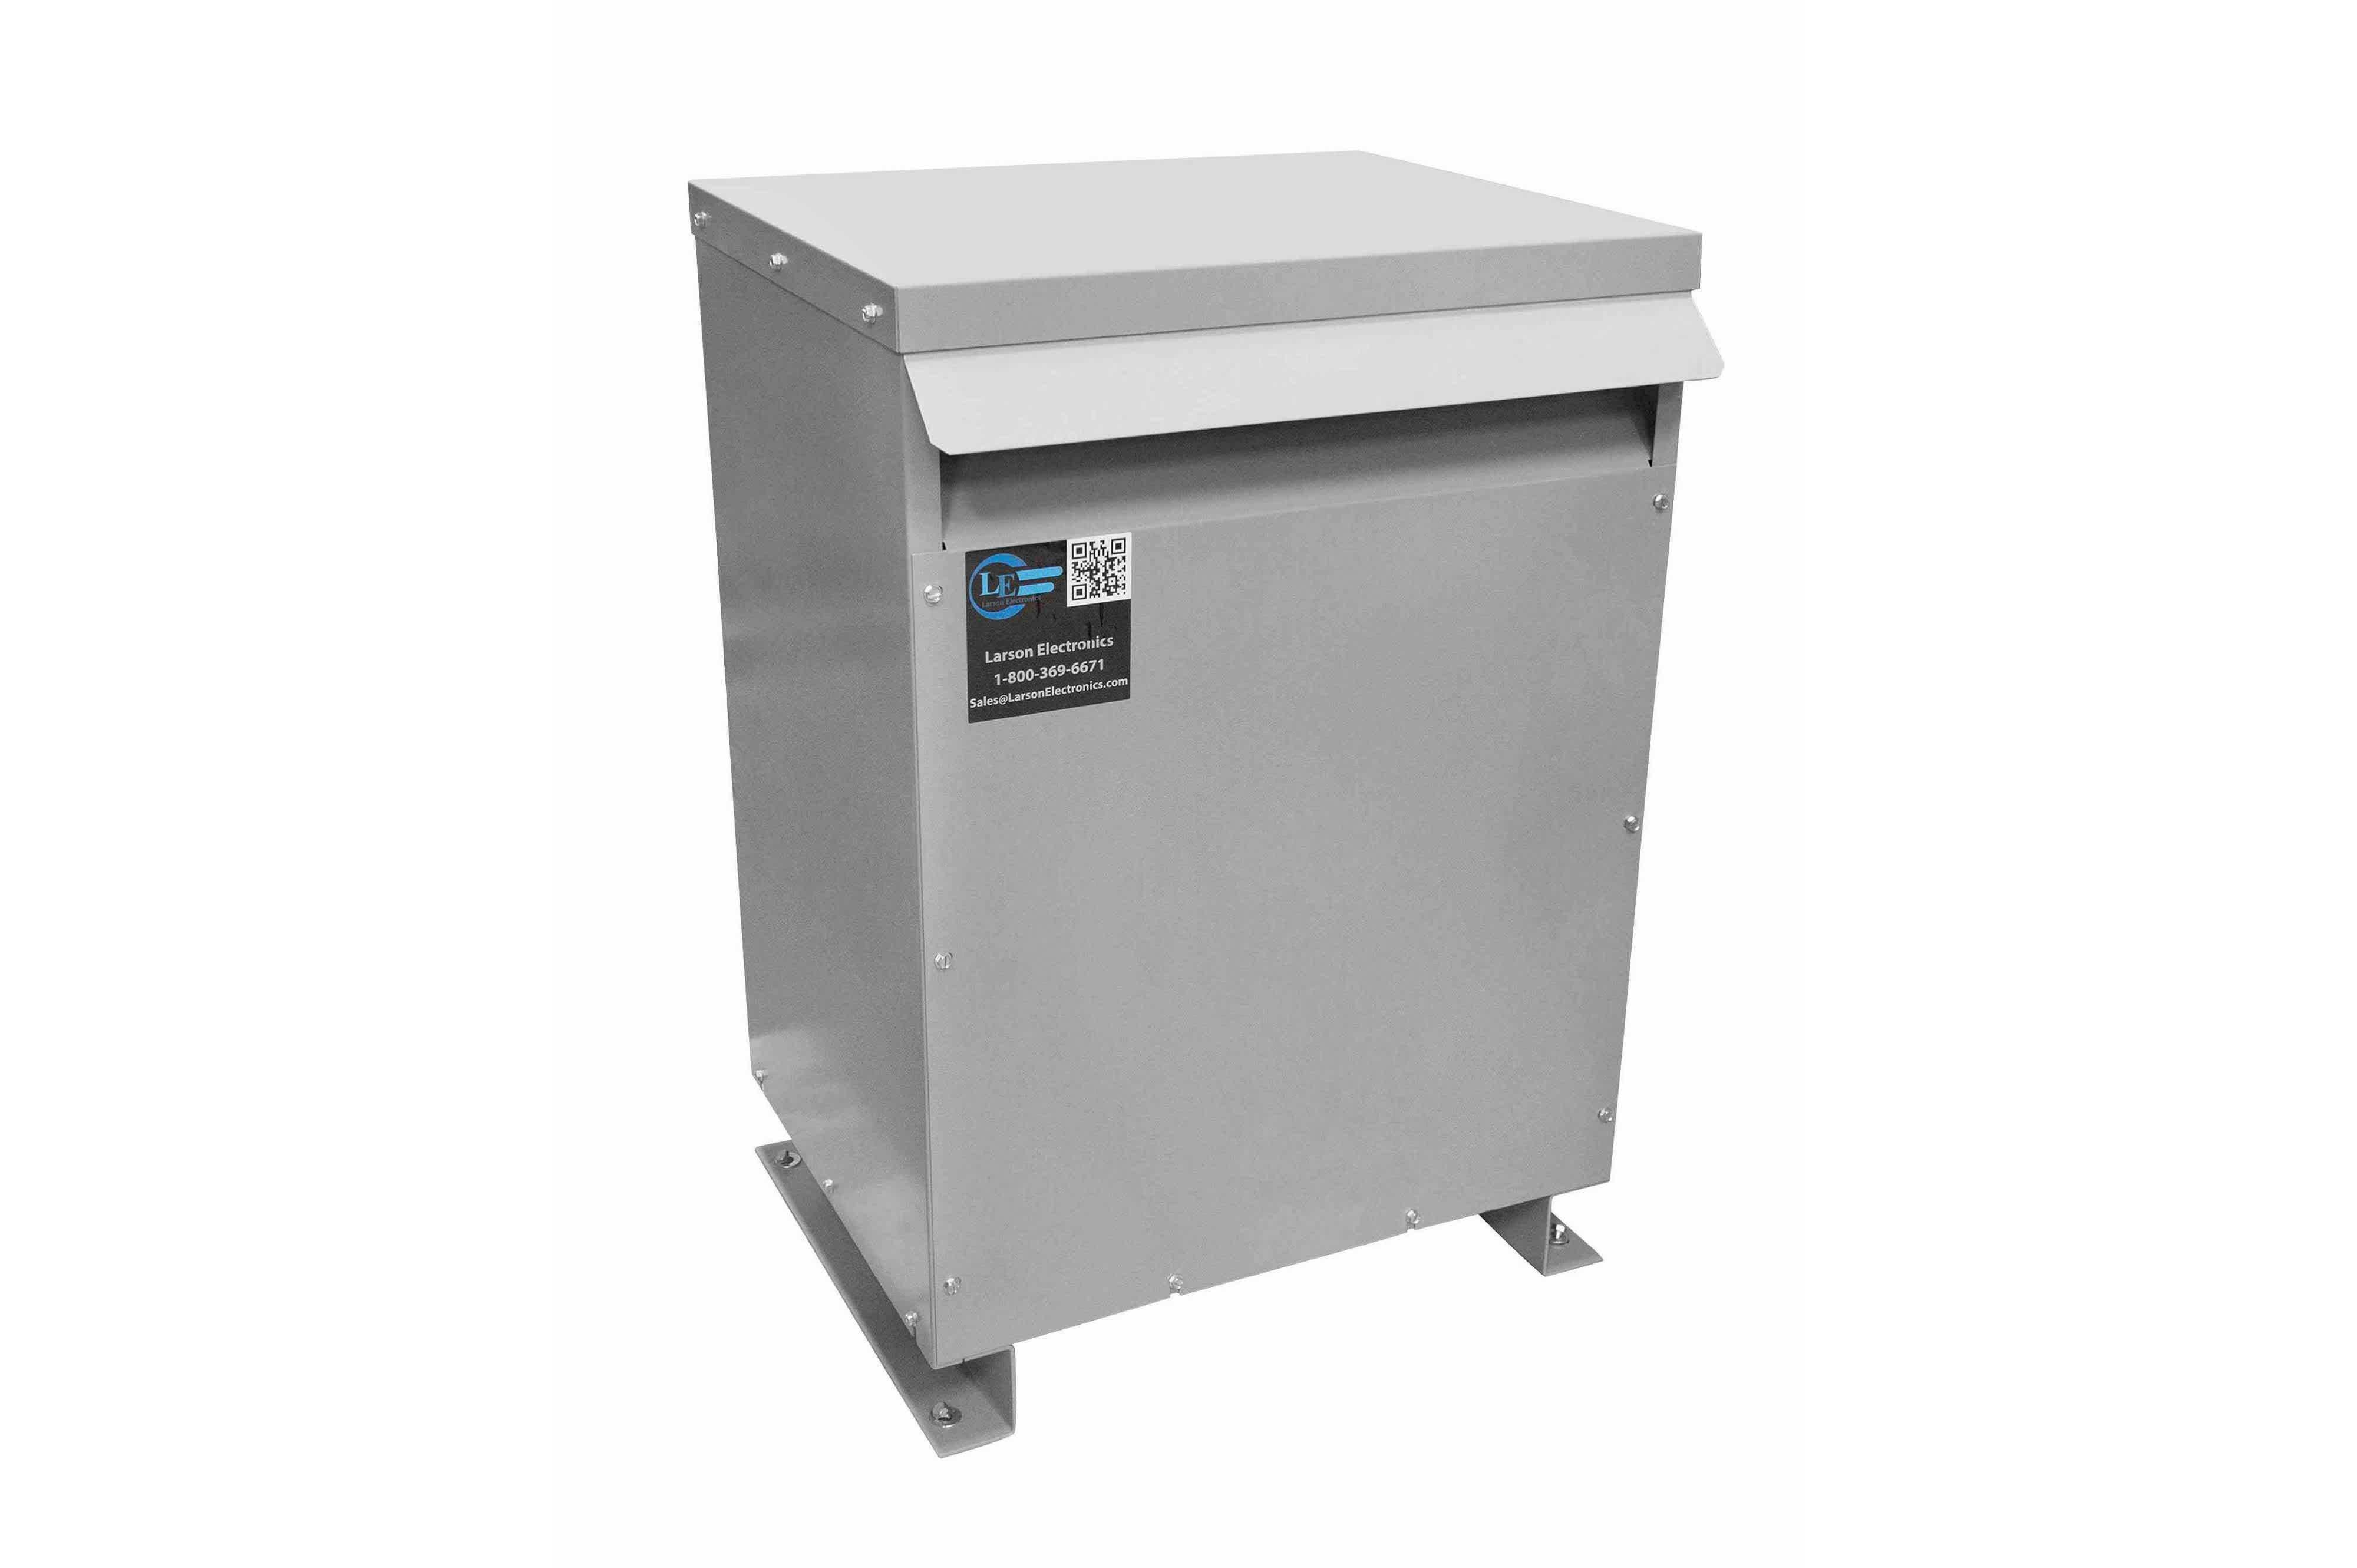 150 kVA 3PH DOE Transformer, 575V Delta Primary, 380Y/220 Wye-N Secondary, N3R, Ventilated, 60 Hz